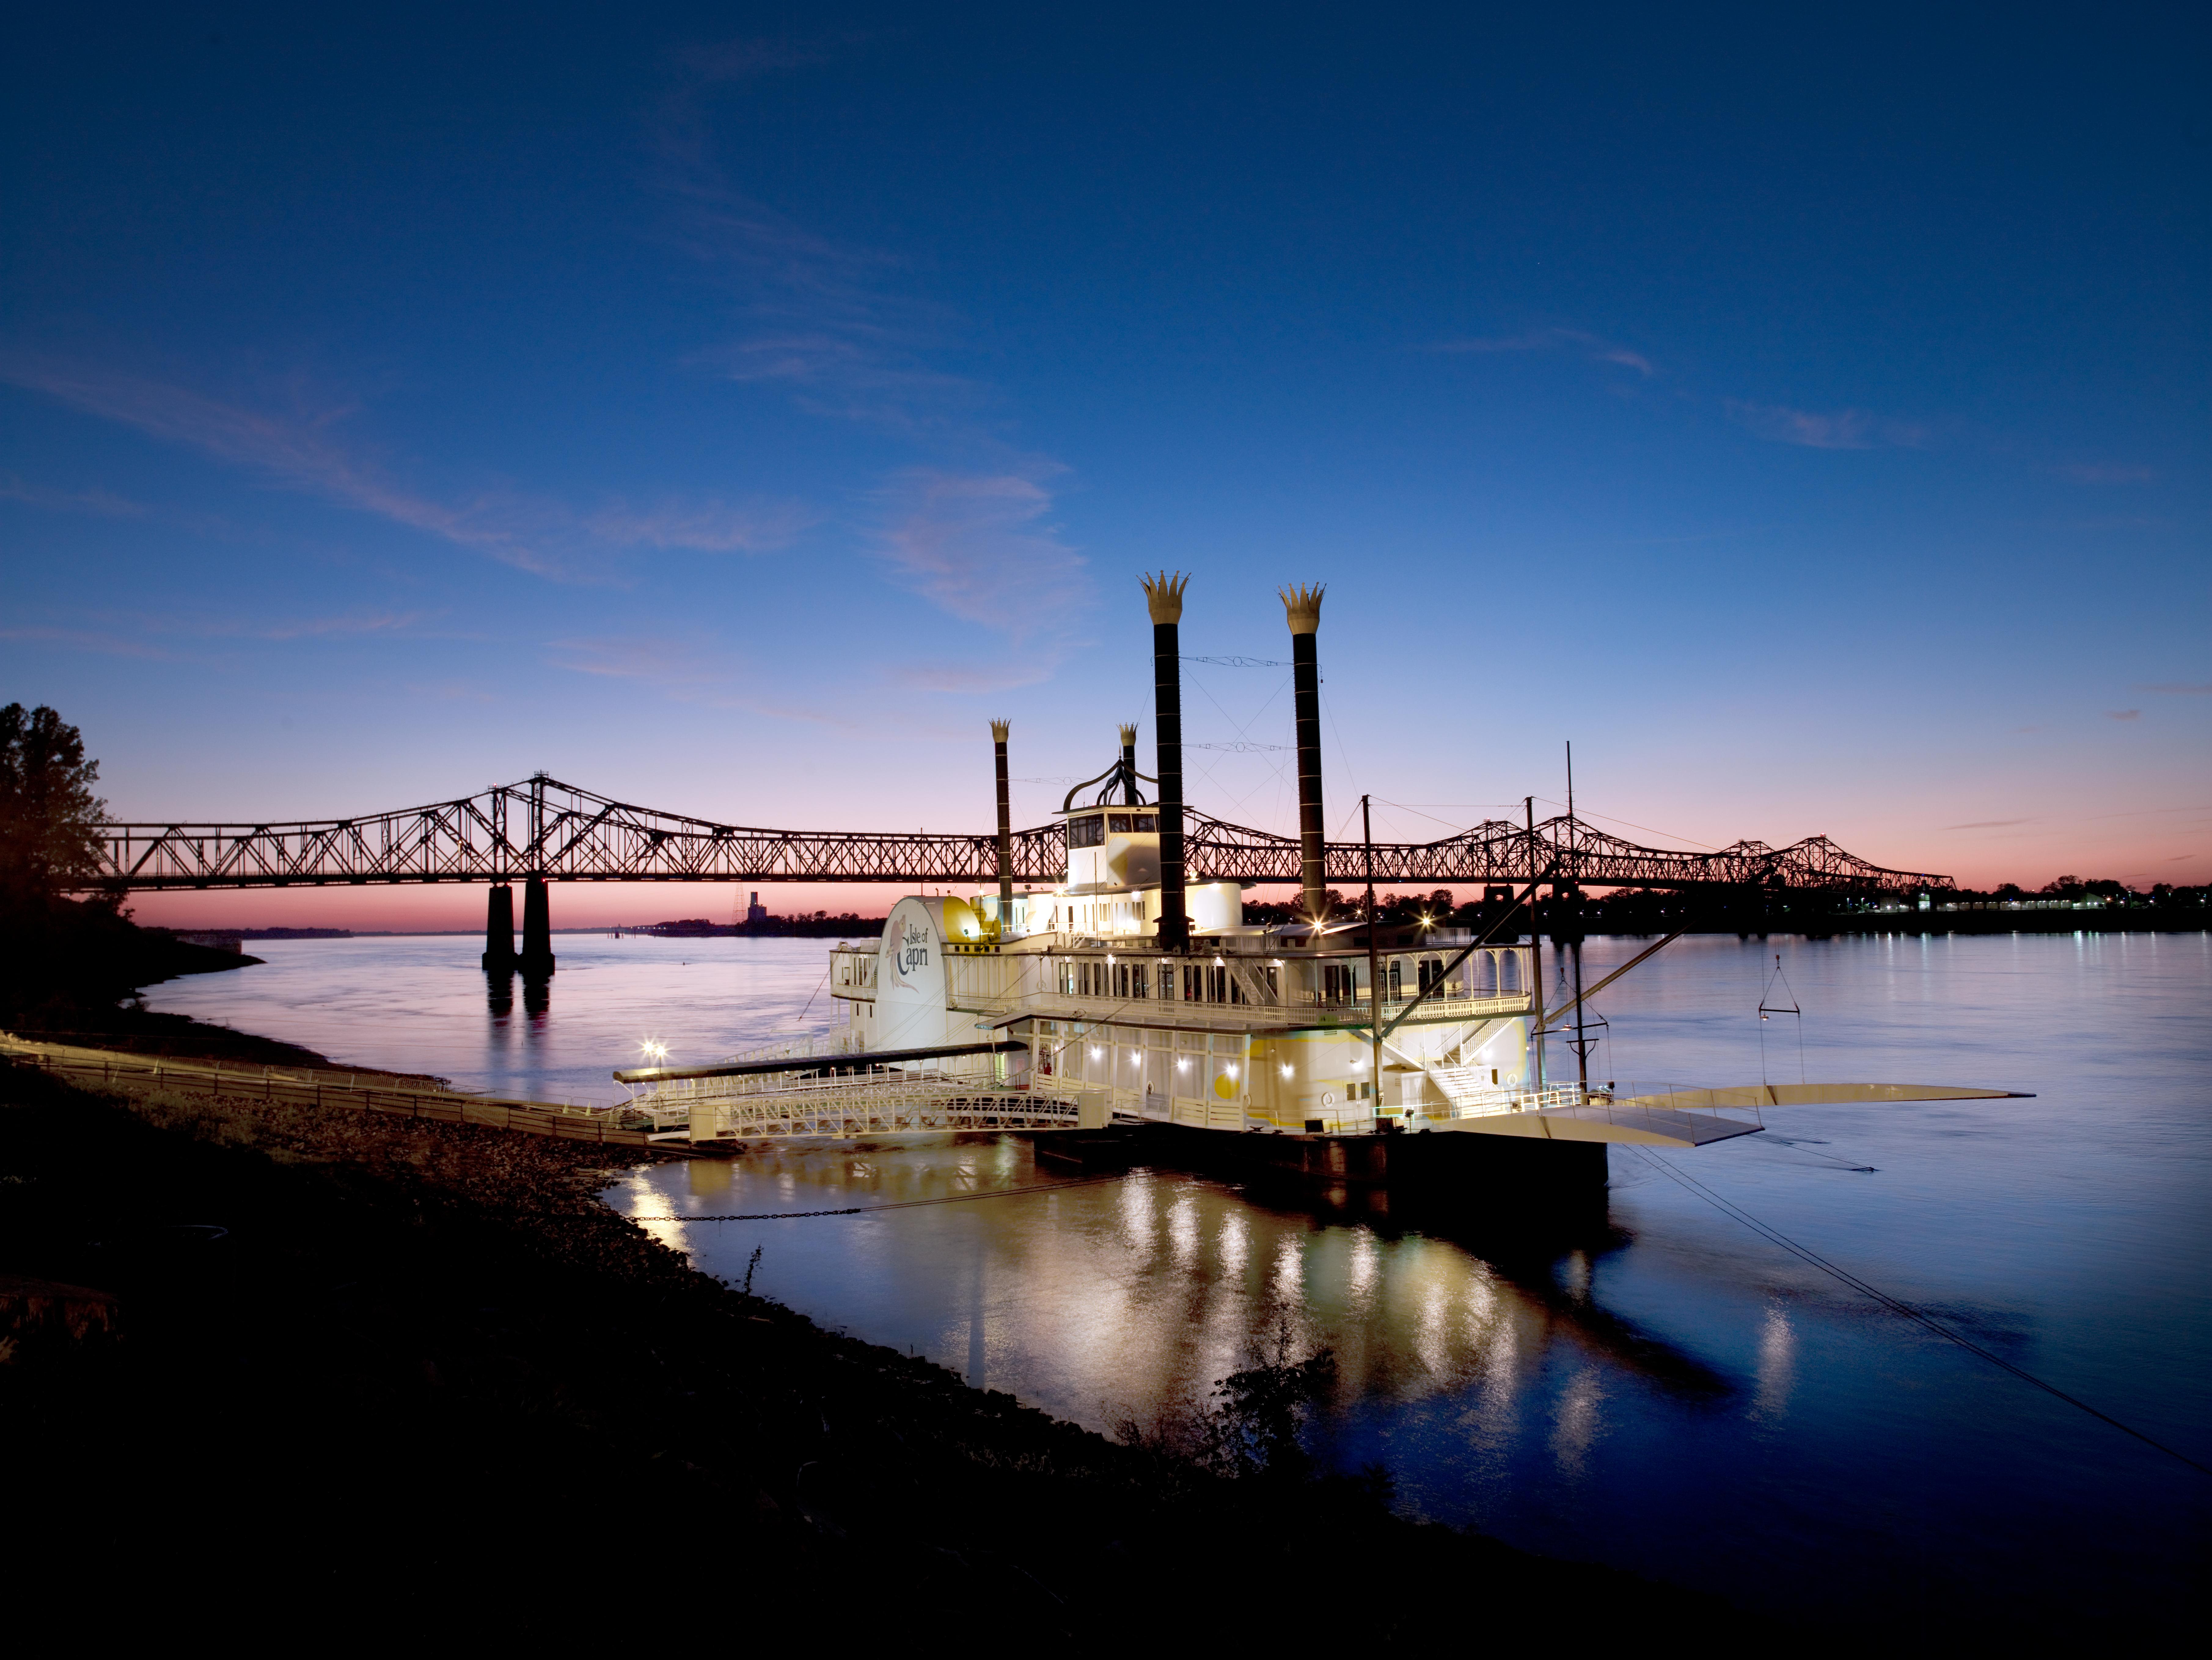 Mississippi river gambling boat casino charles hotel lac lake